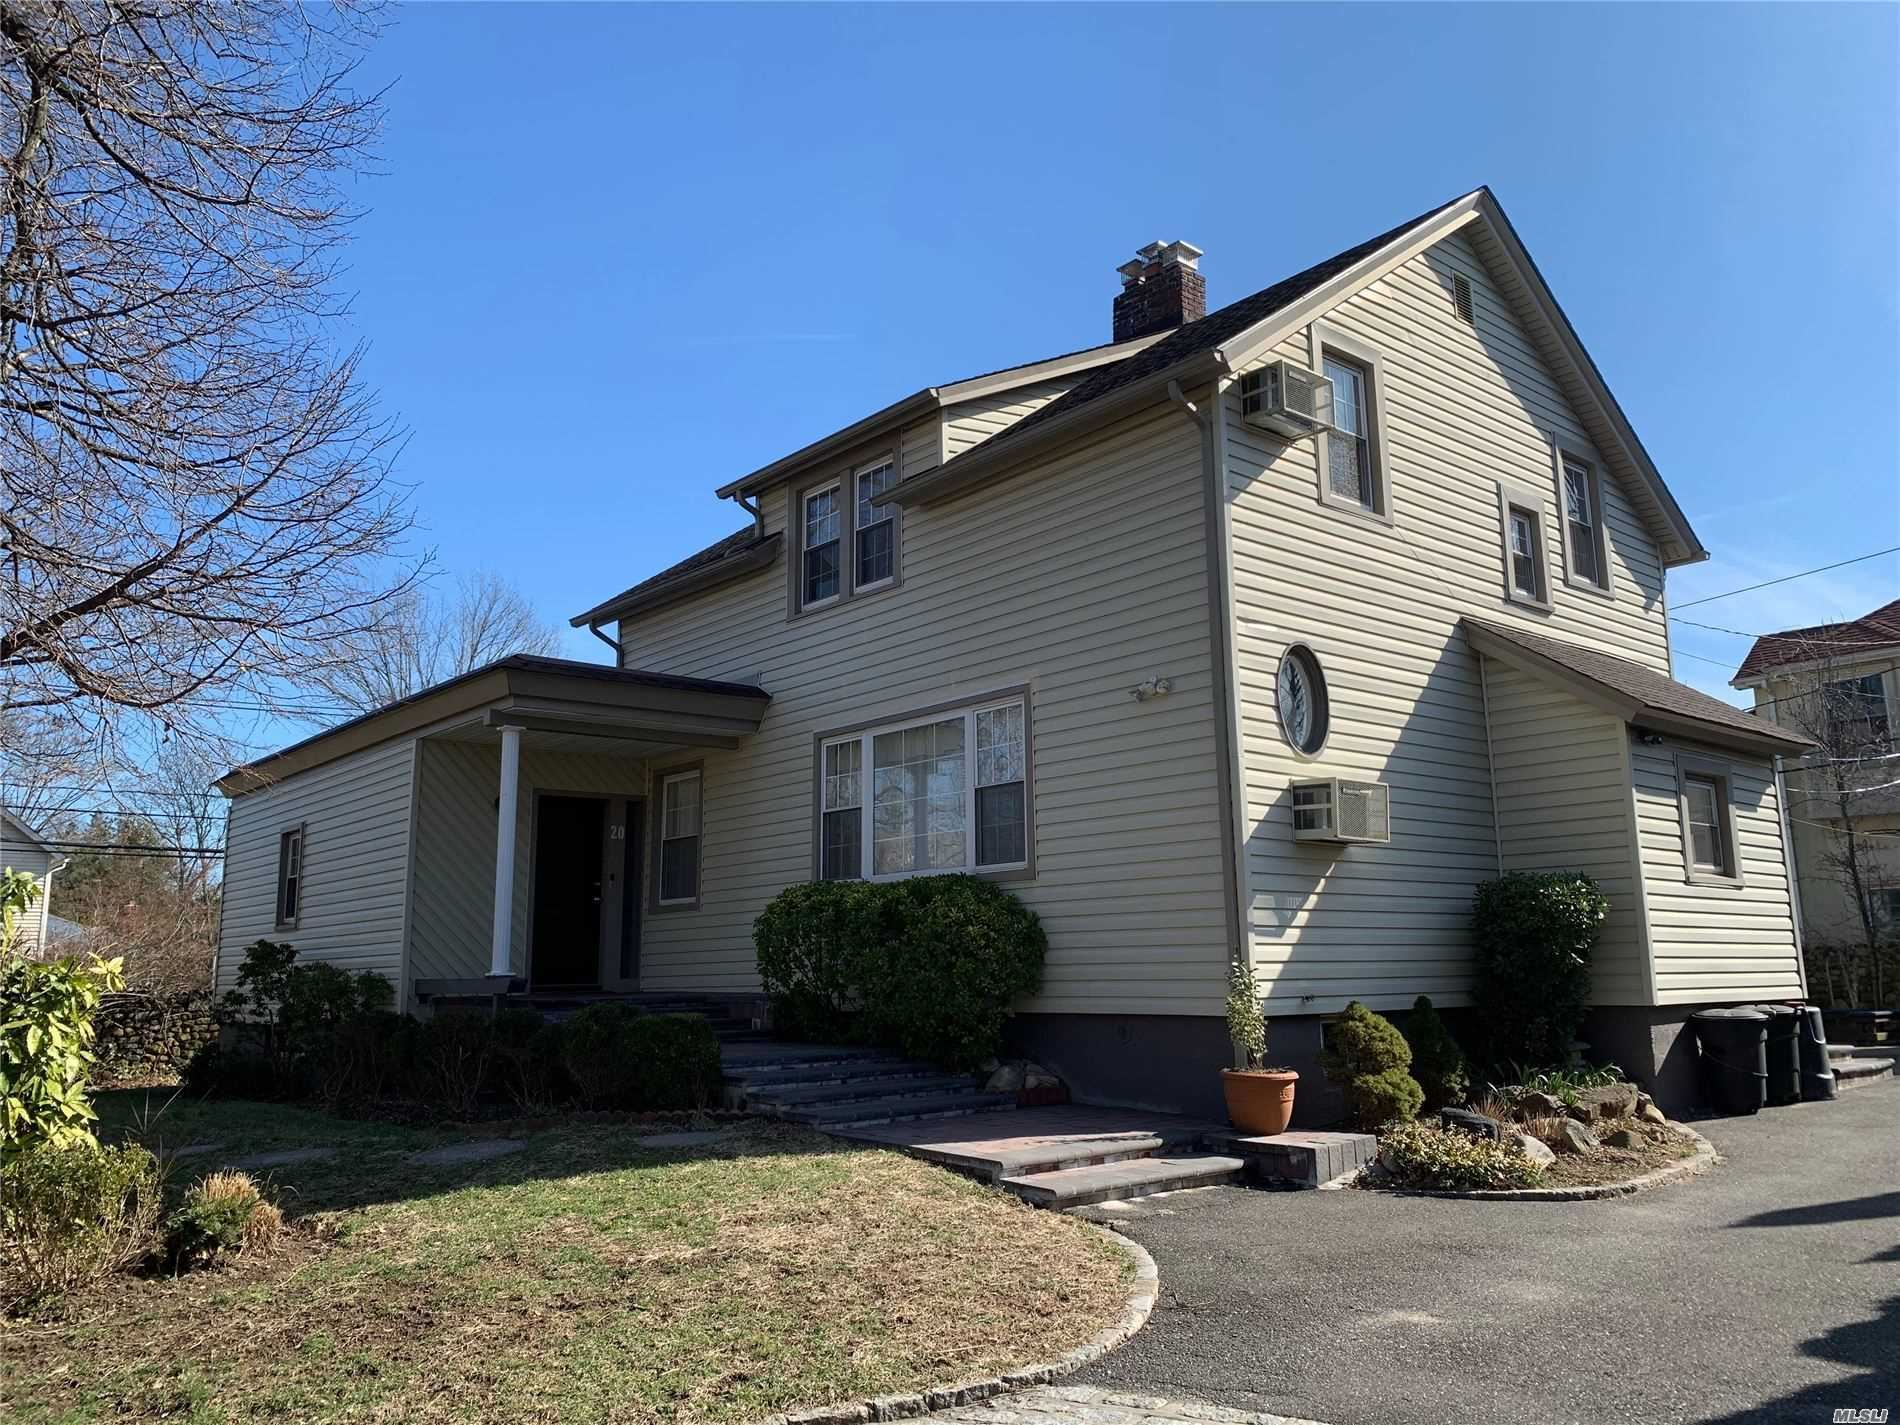 20 Gutheil Lane, Great Neck, NY 11024 - MLS#: 3201535